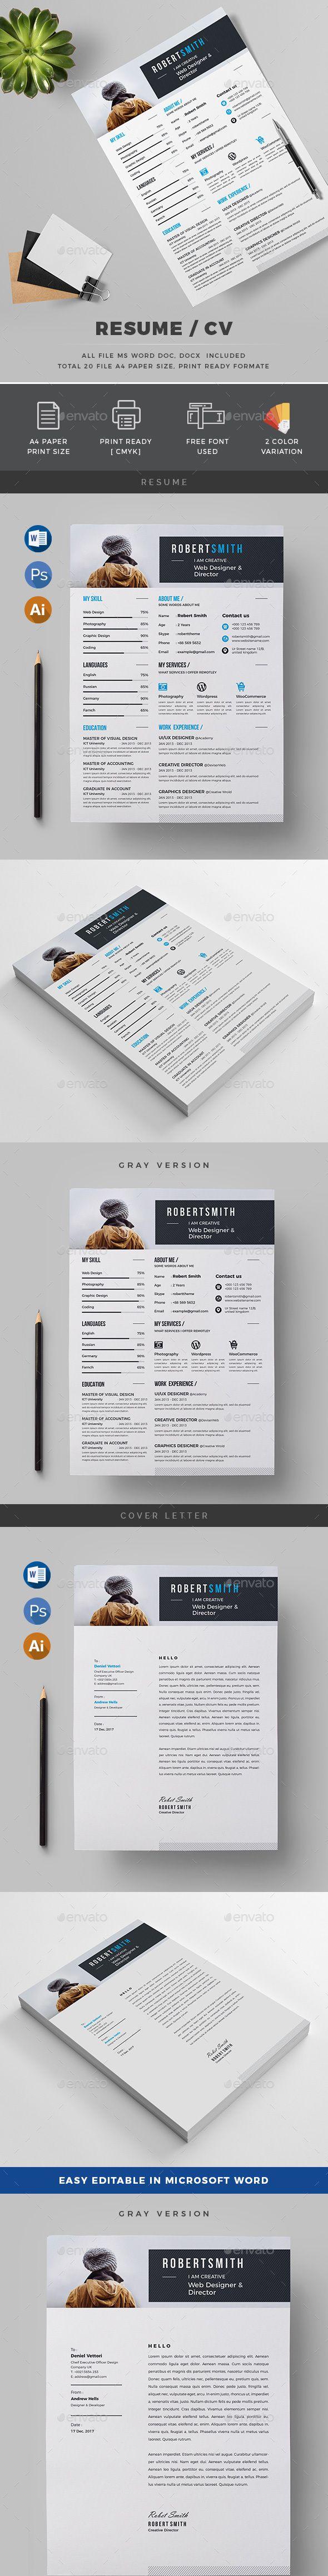 Resume/CV Simple resume template, Resume design template